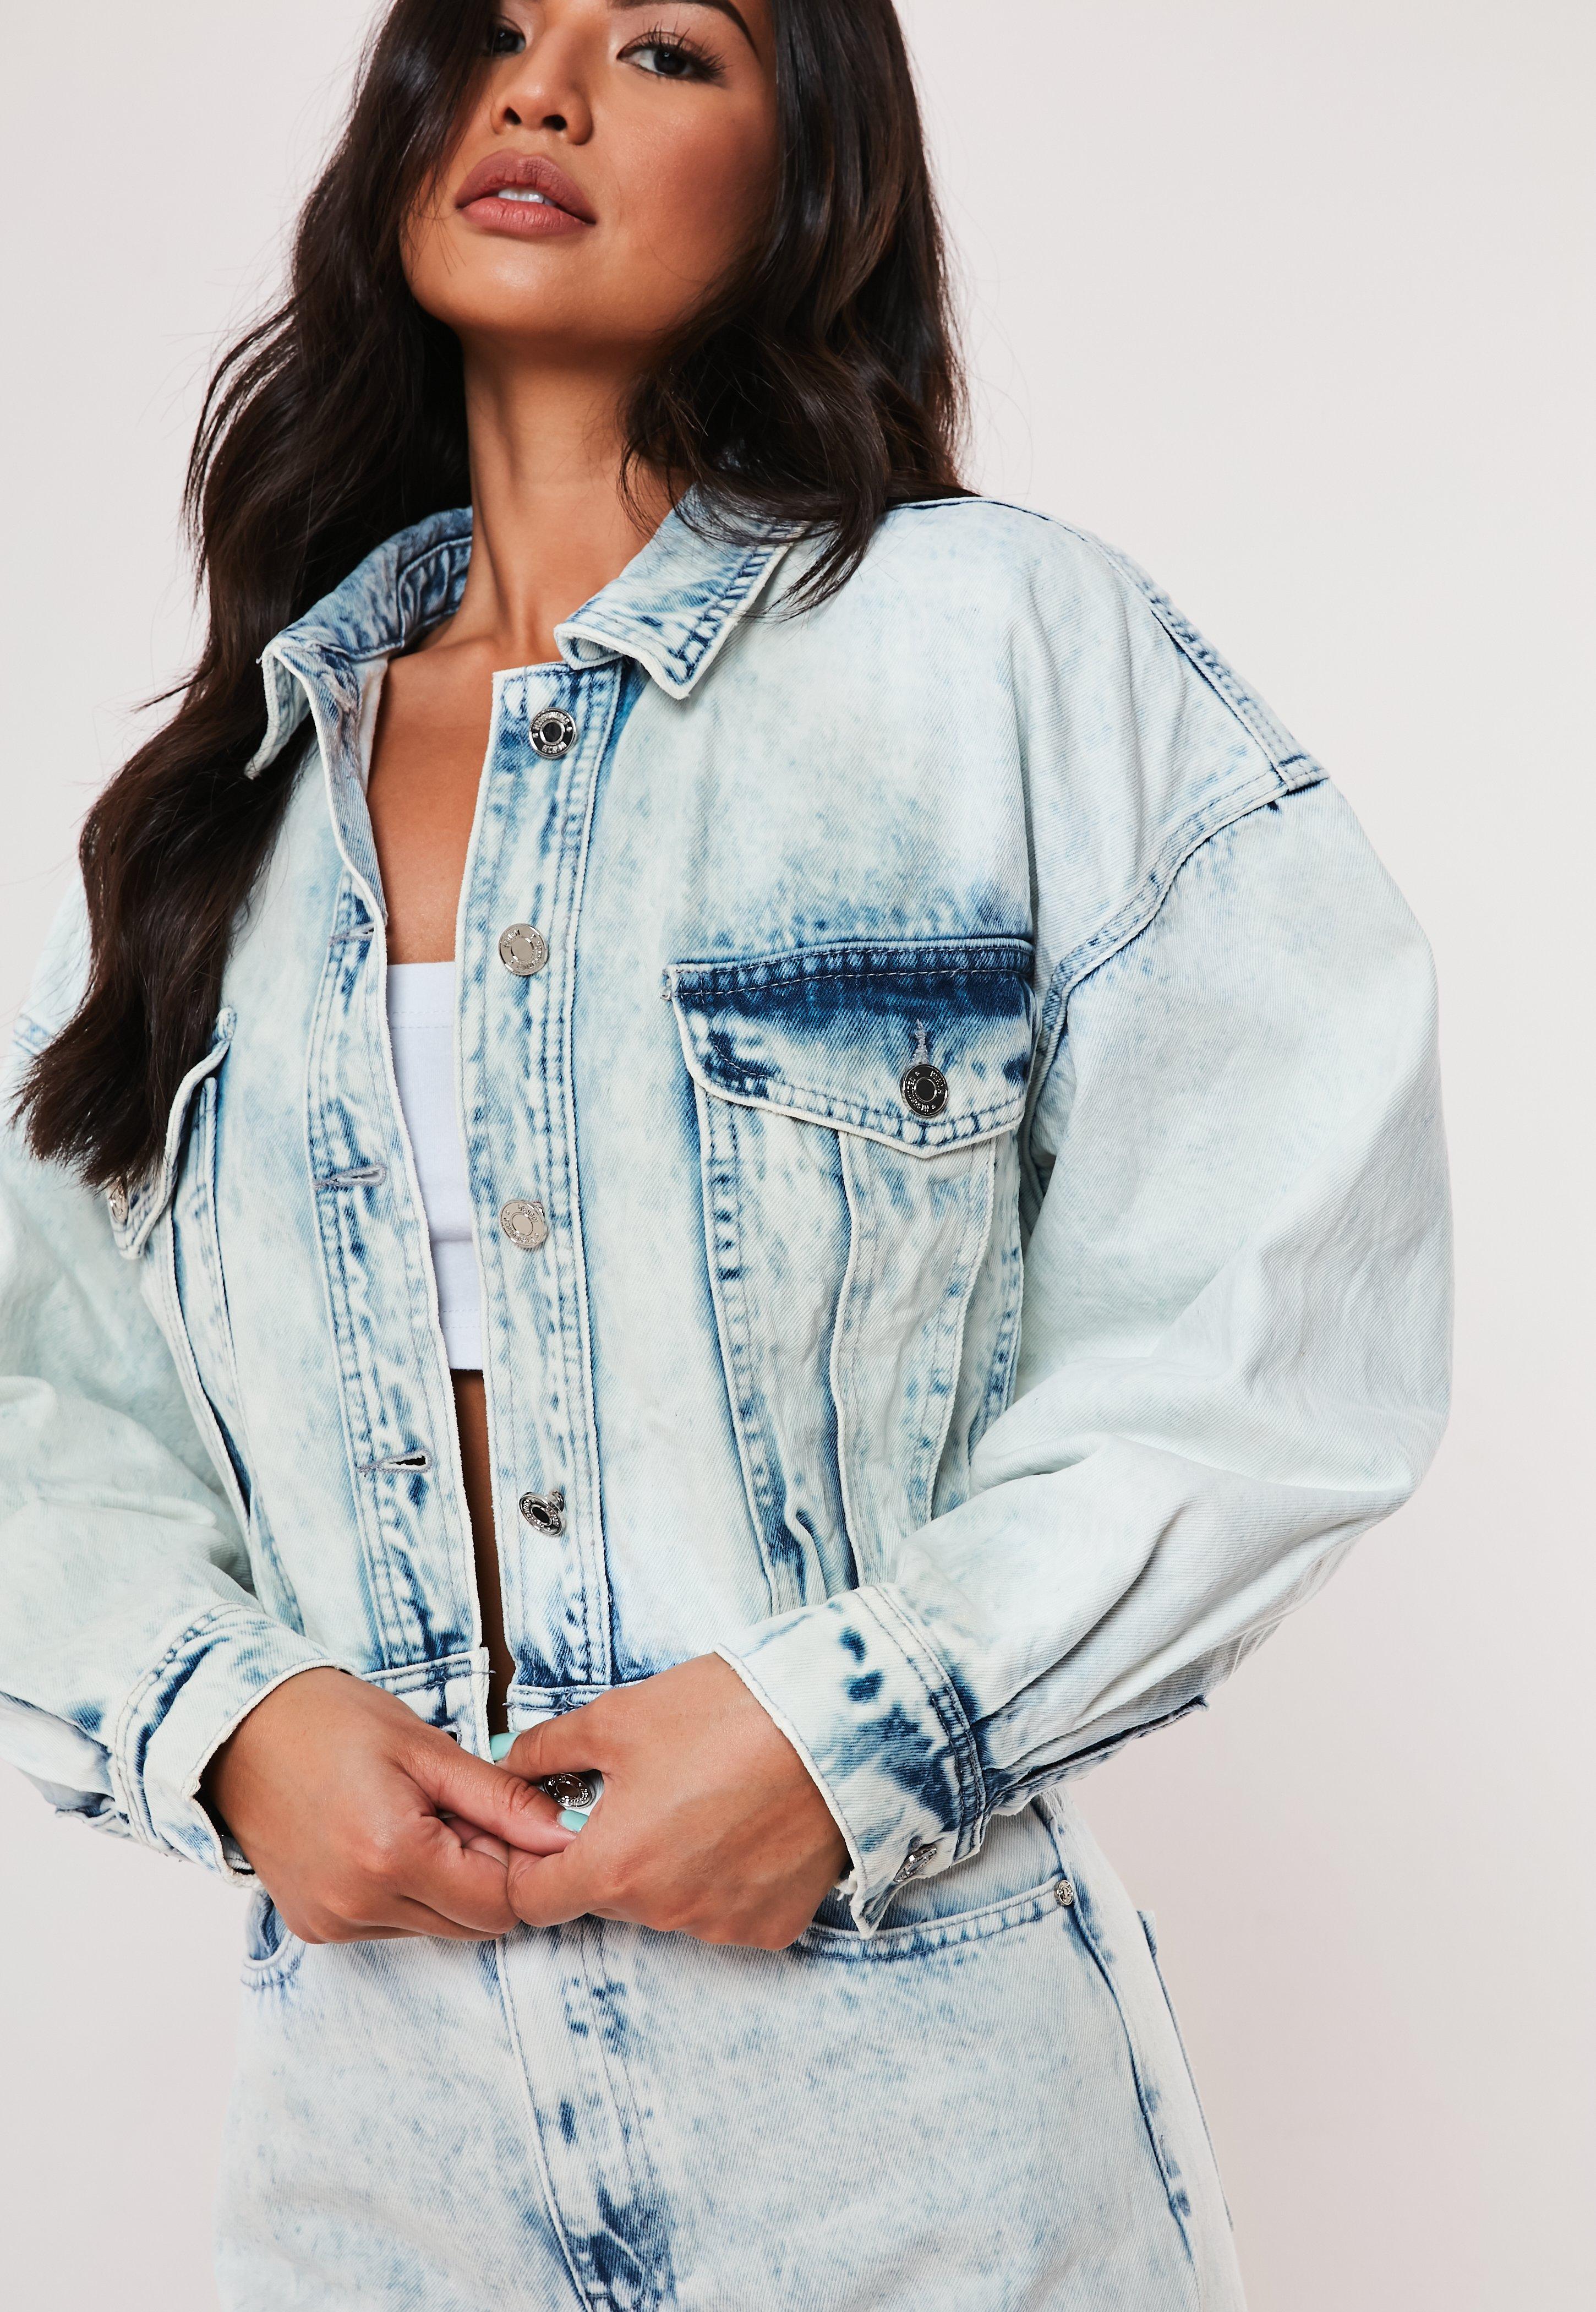 538e26f35dc Women's Denim Jackets | Cropped Denim Jackets | Missguided